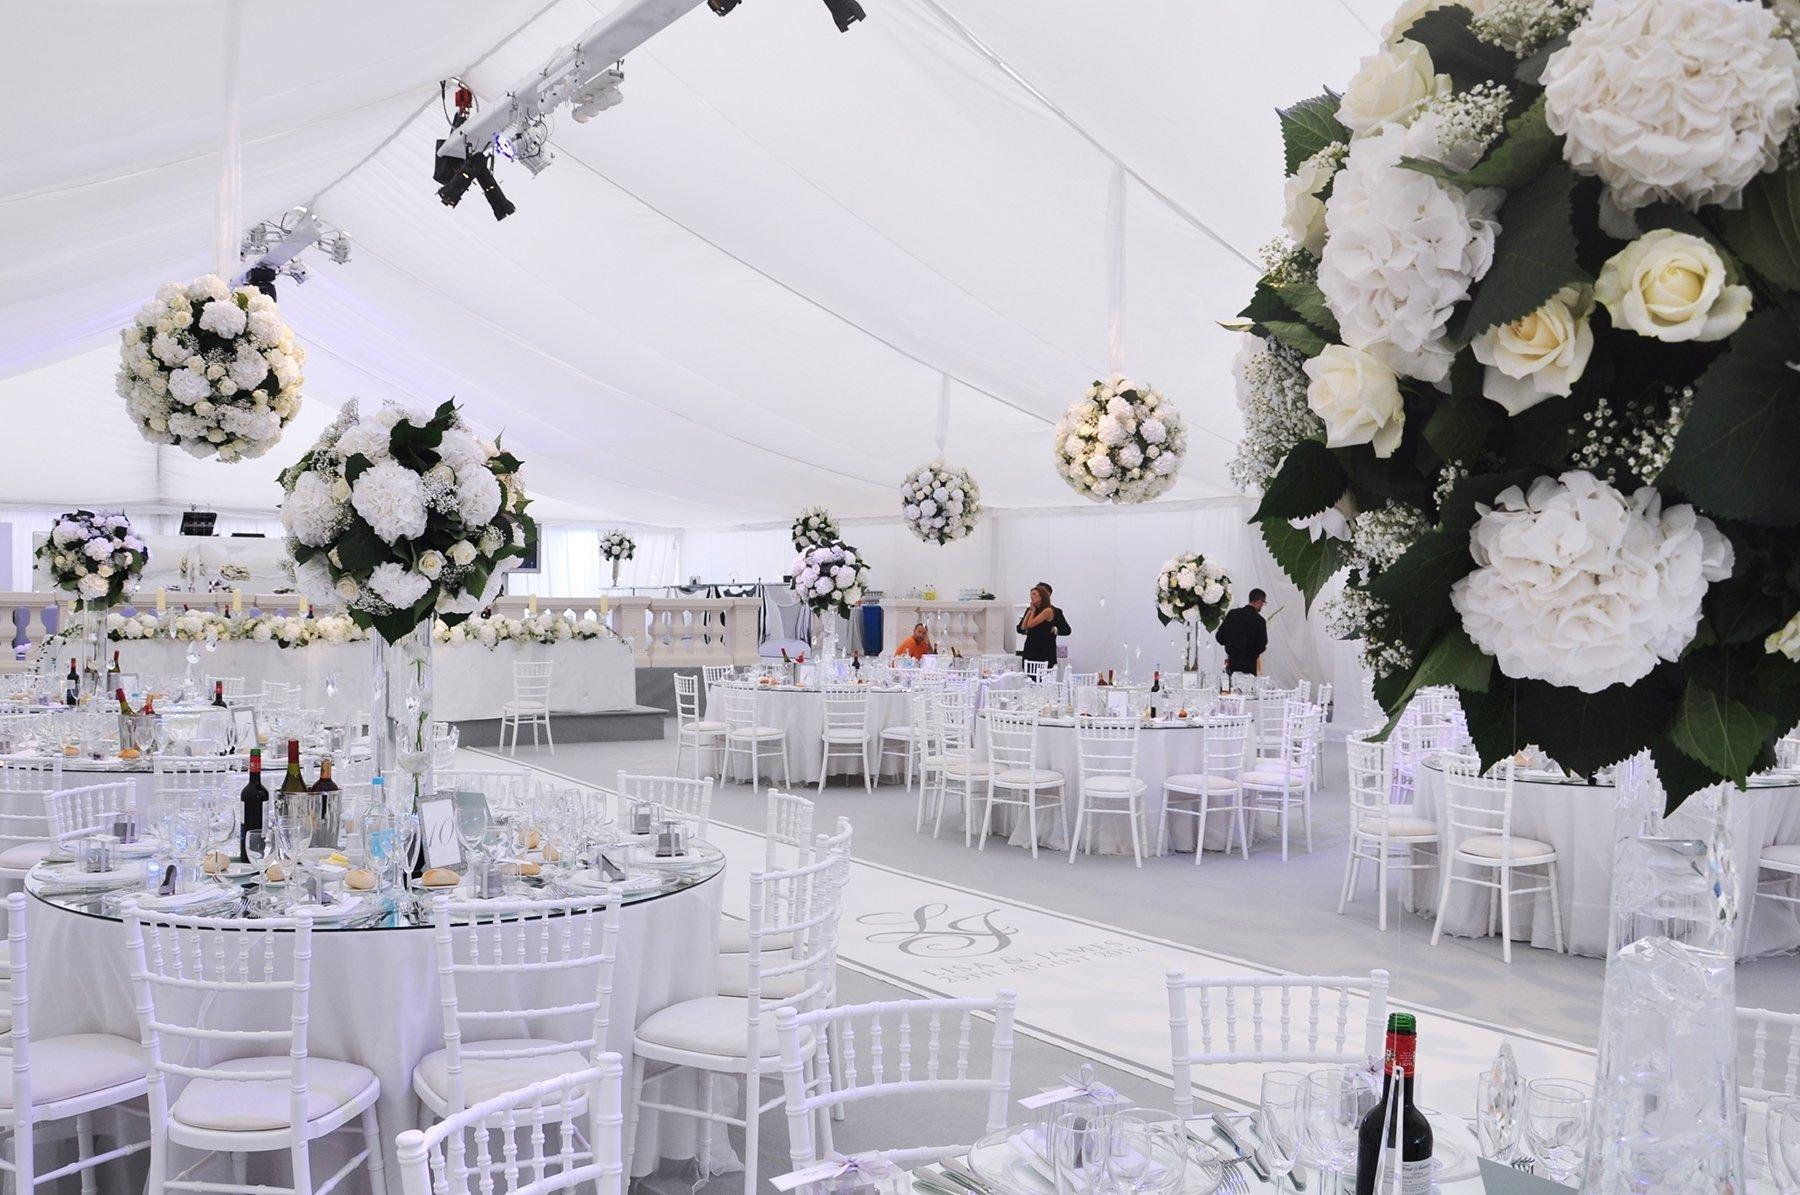 10 Fantastic Unique Wedding Ideas For Reception unique wedding reception ideas wedding themes be inspired